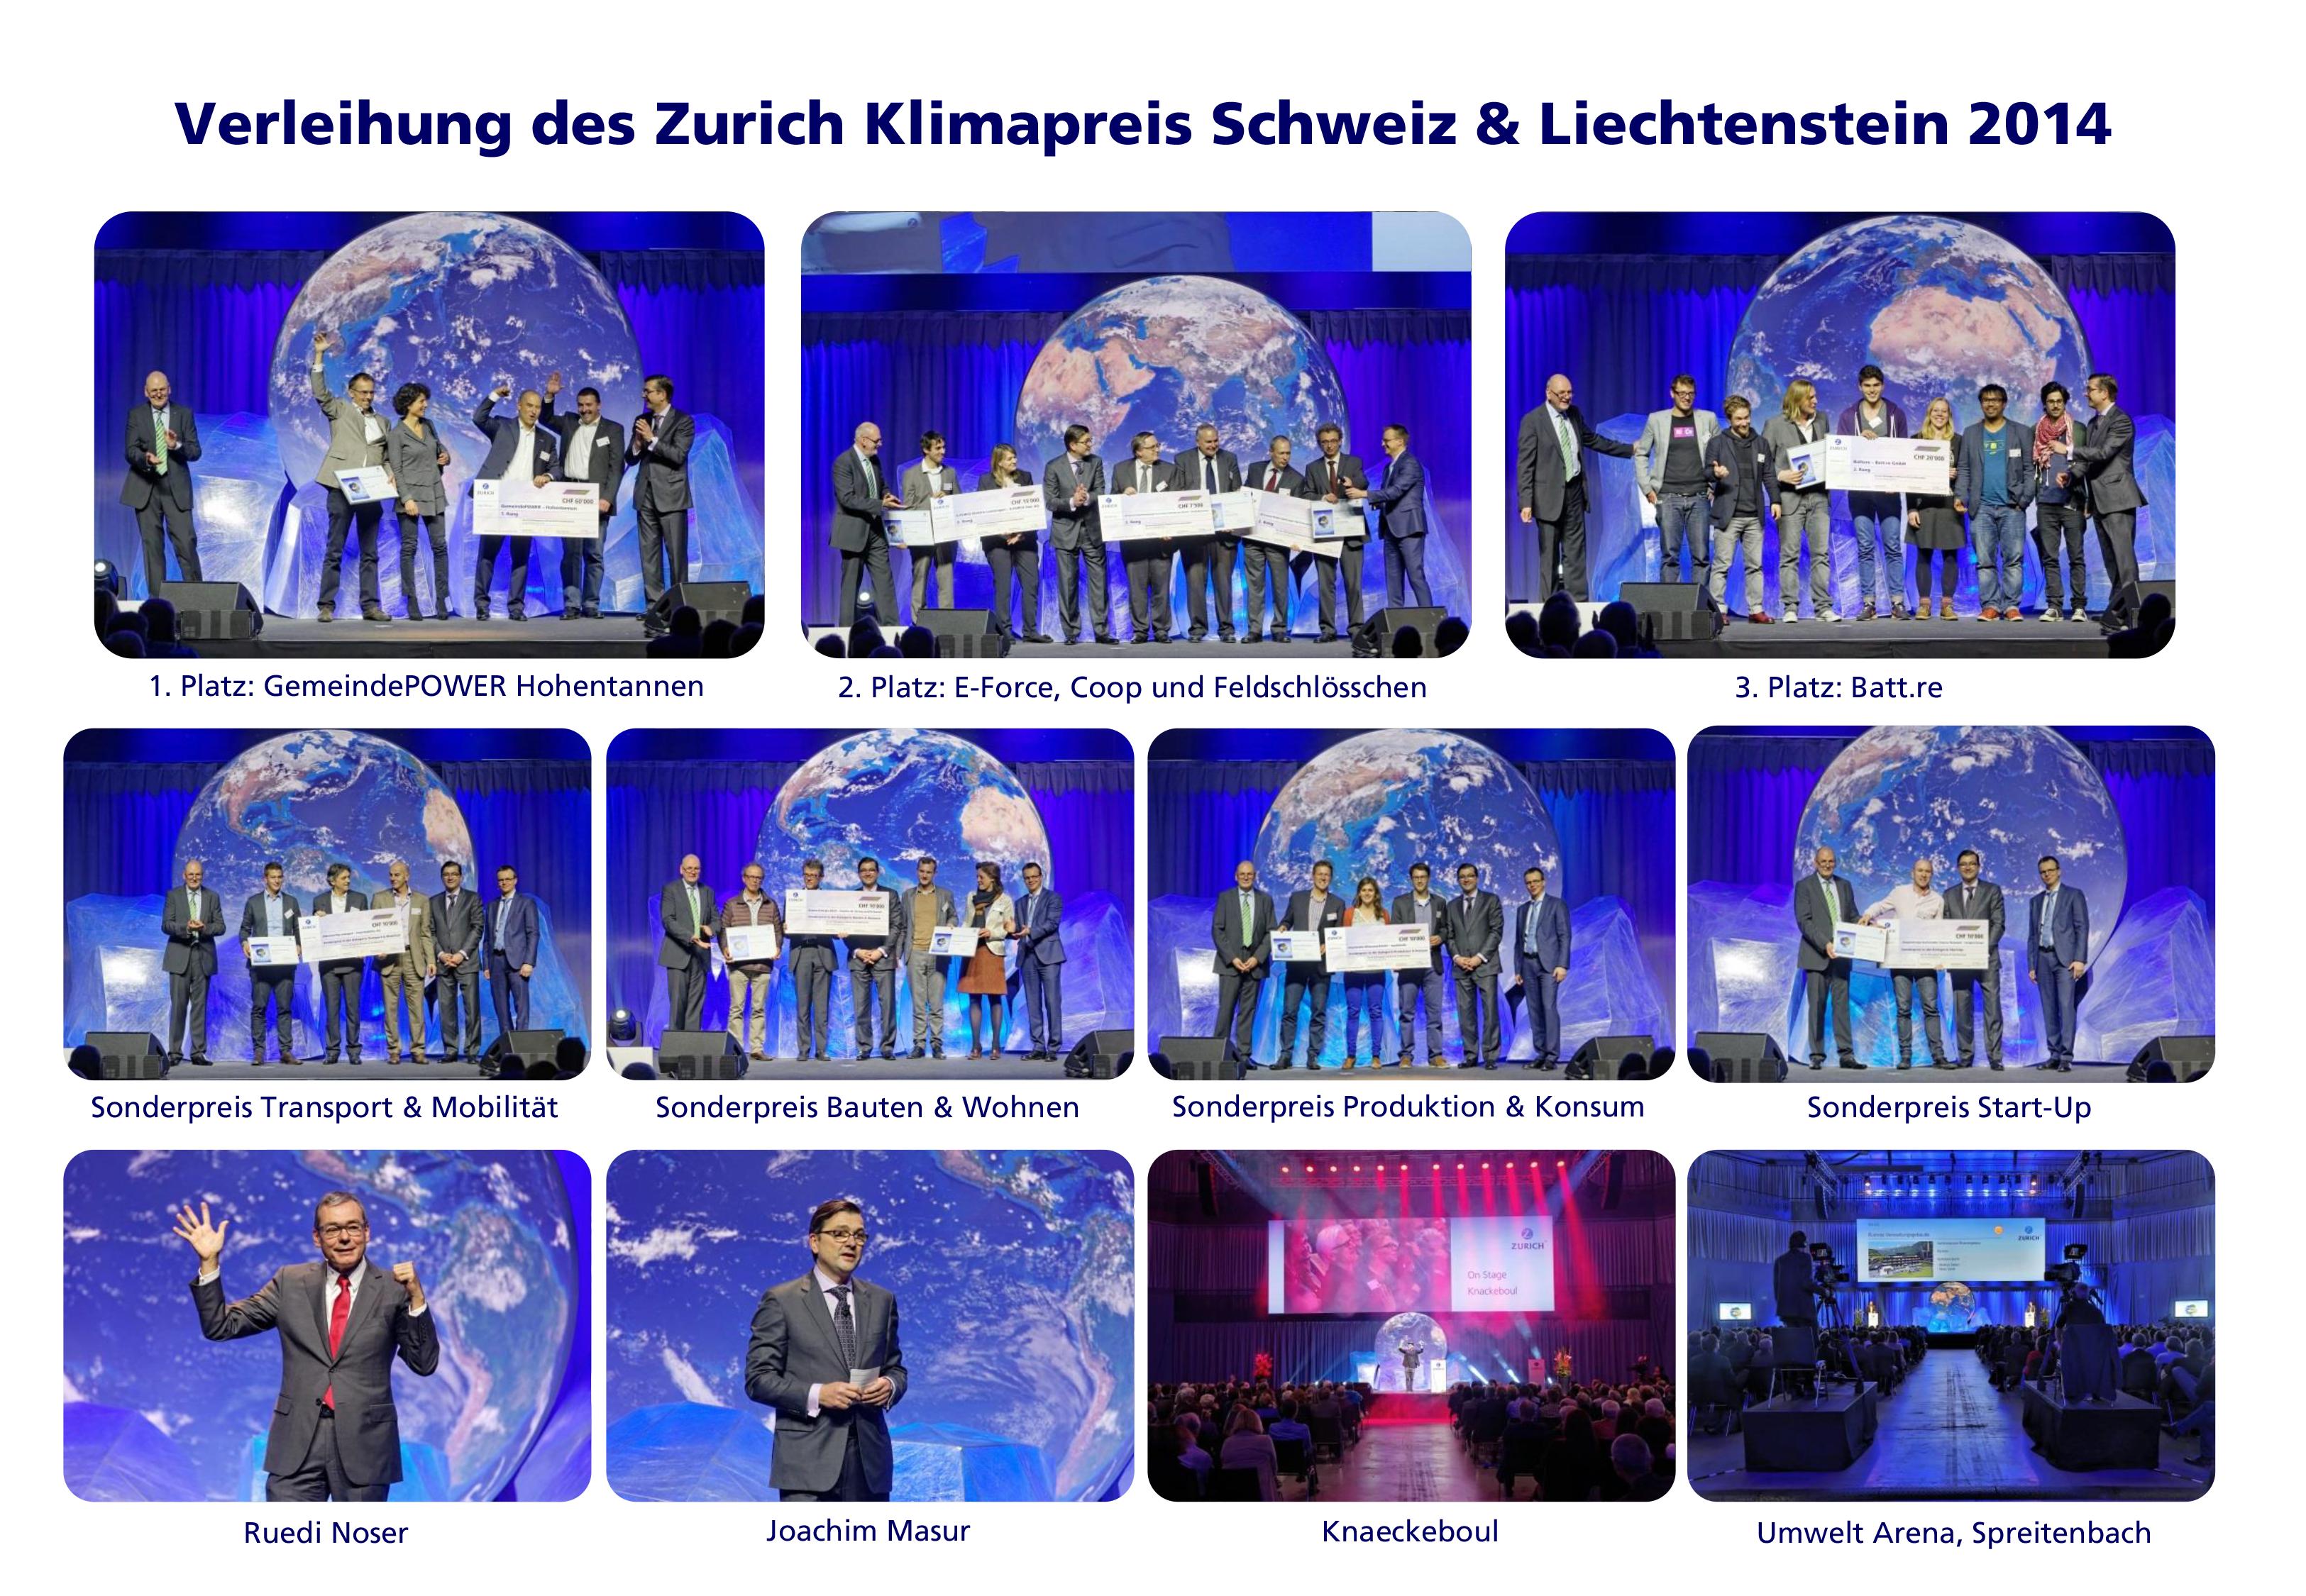 Verleihung_Klimapreis_2014_Ruedi-Noser